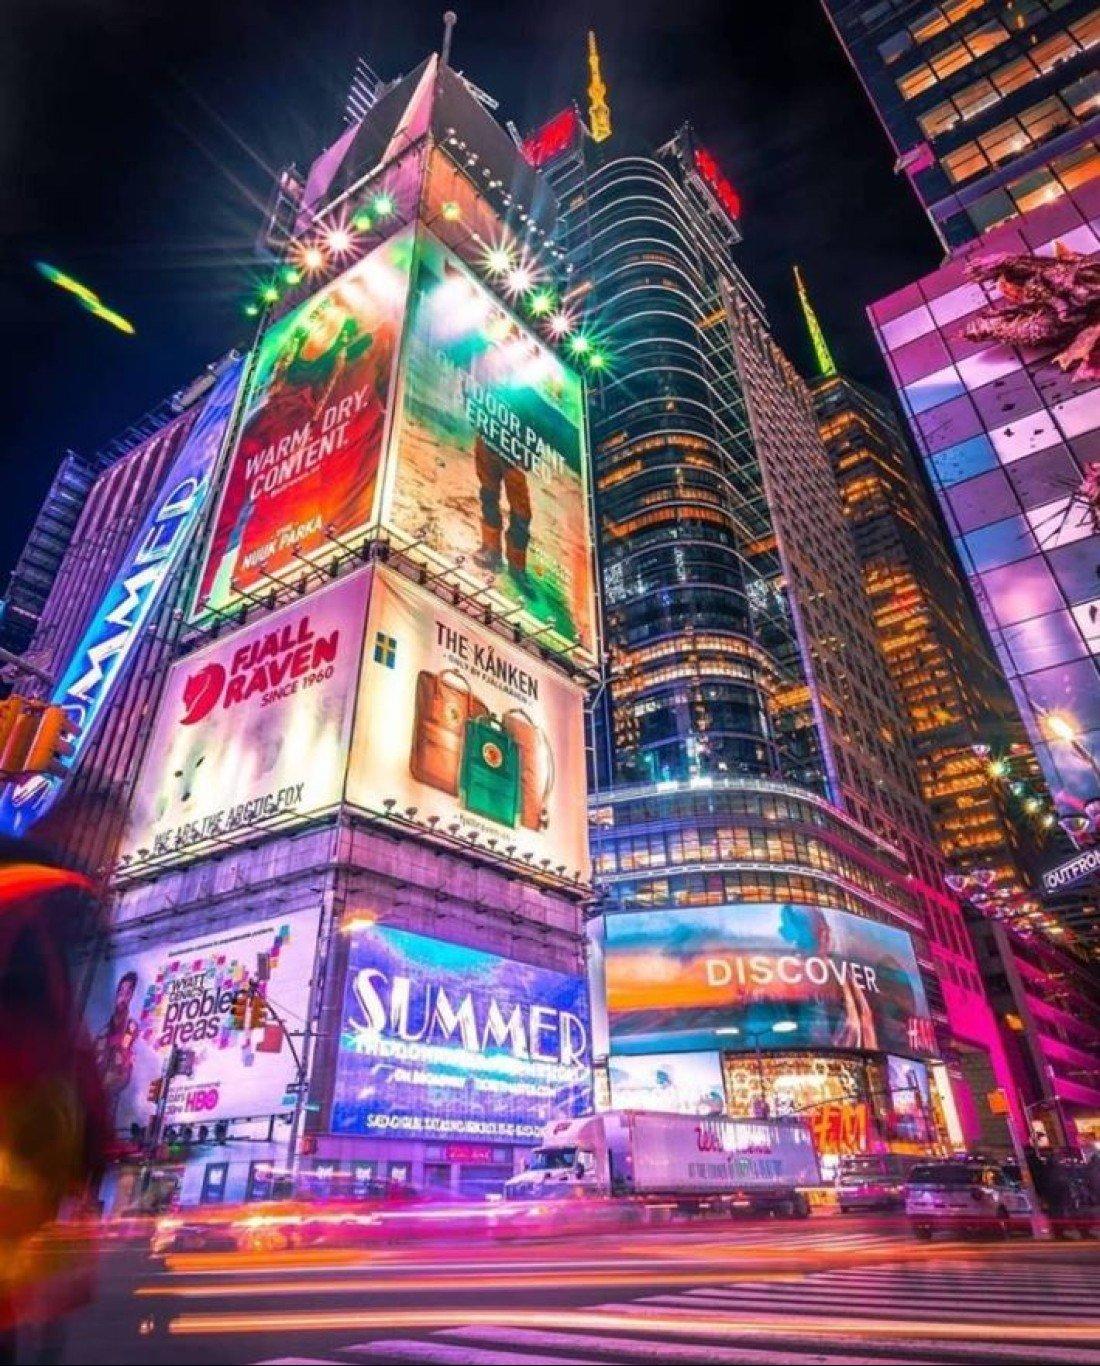 New York City Bus Trip December 4, 2021 from Portsmouth, 4 December   Event in Manhattan   AllEvents.in